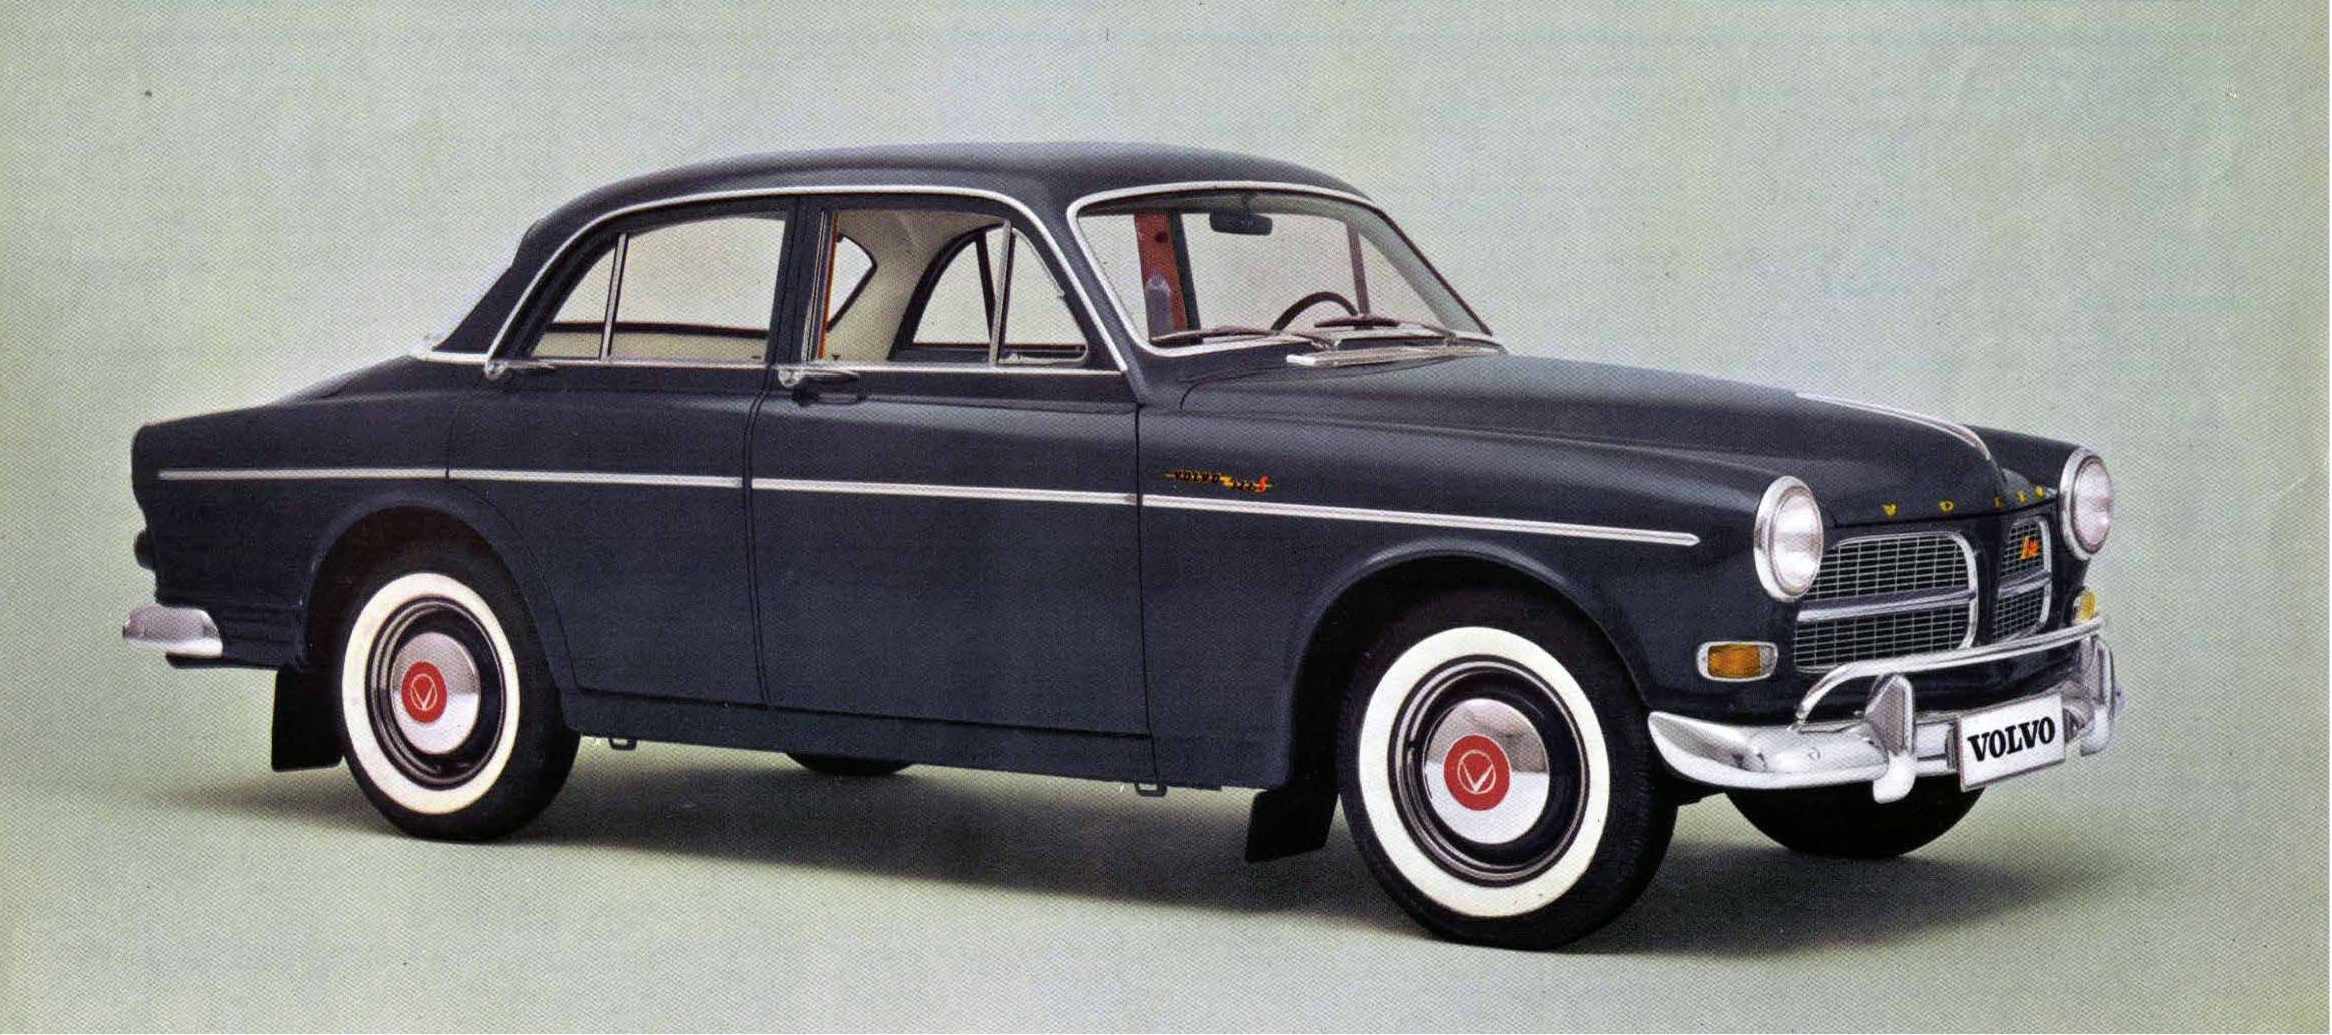 Volvo 120 Series 1956 - 1970 Coupe #1